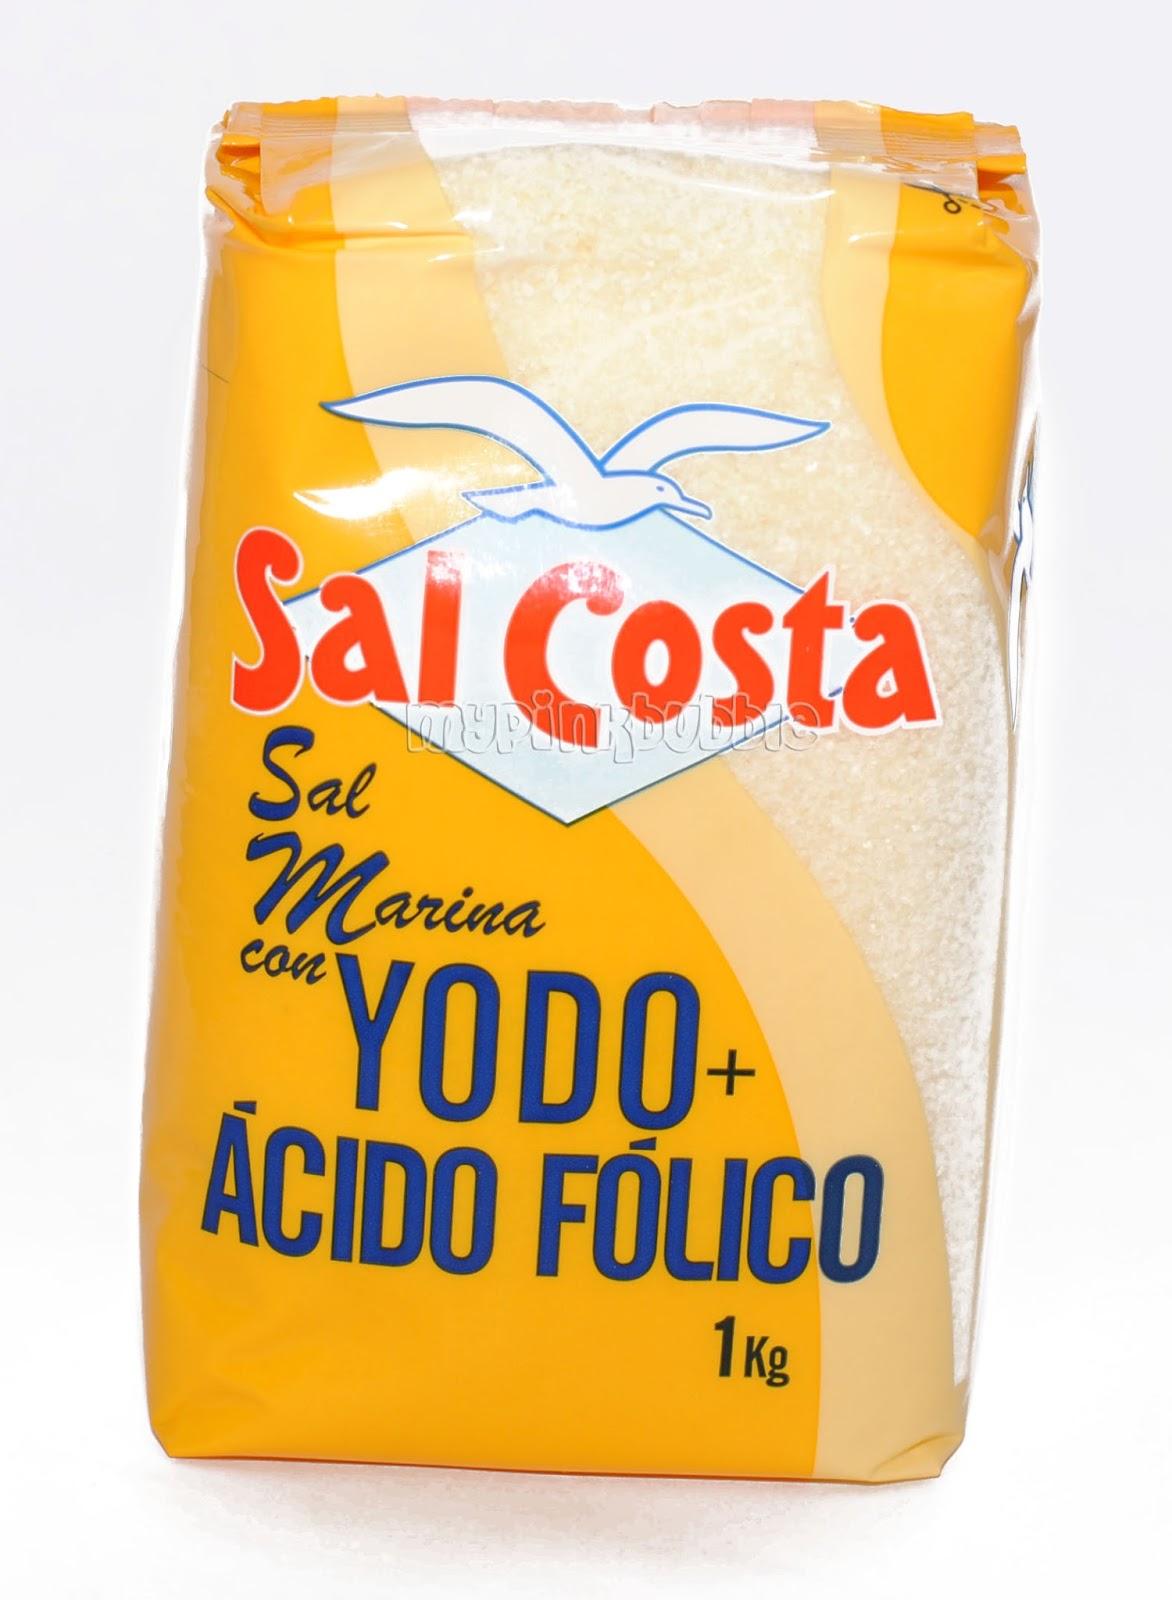 Sal Costa Yodo